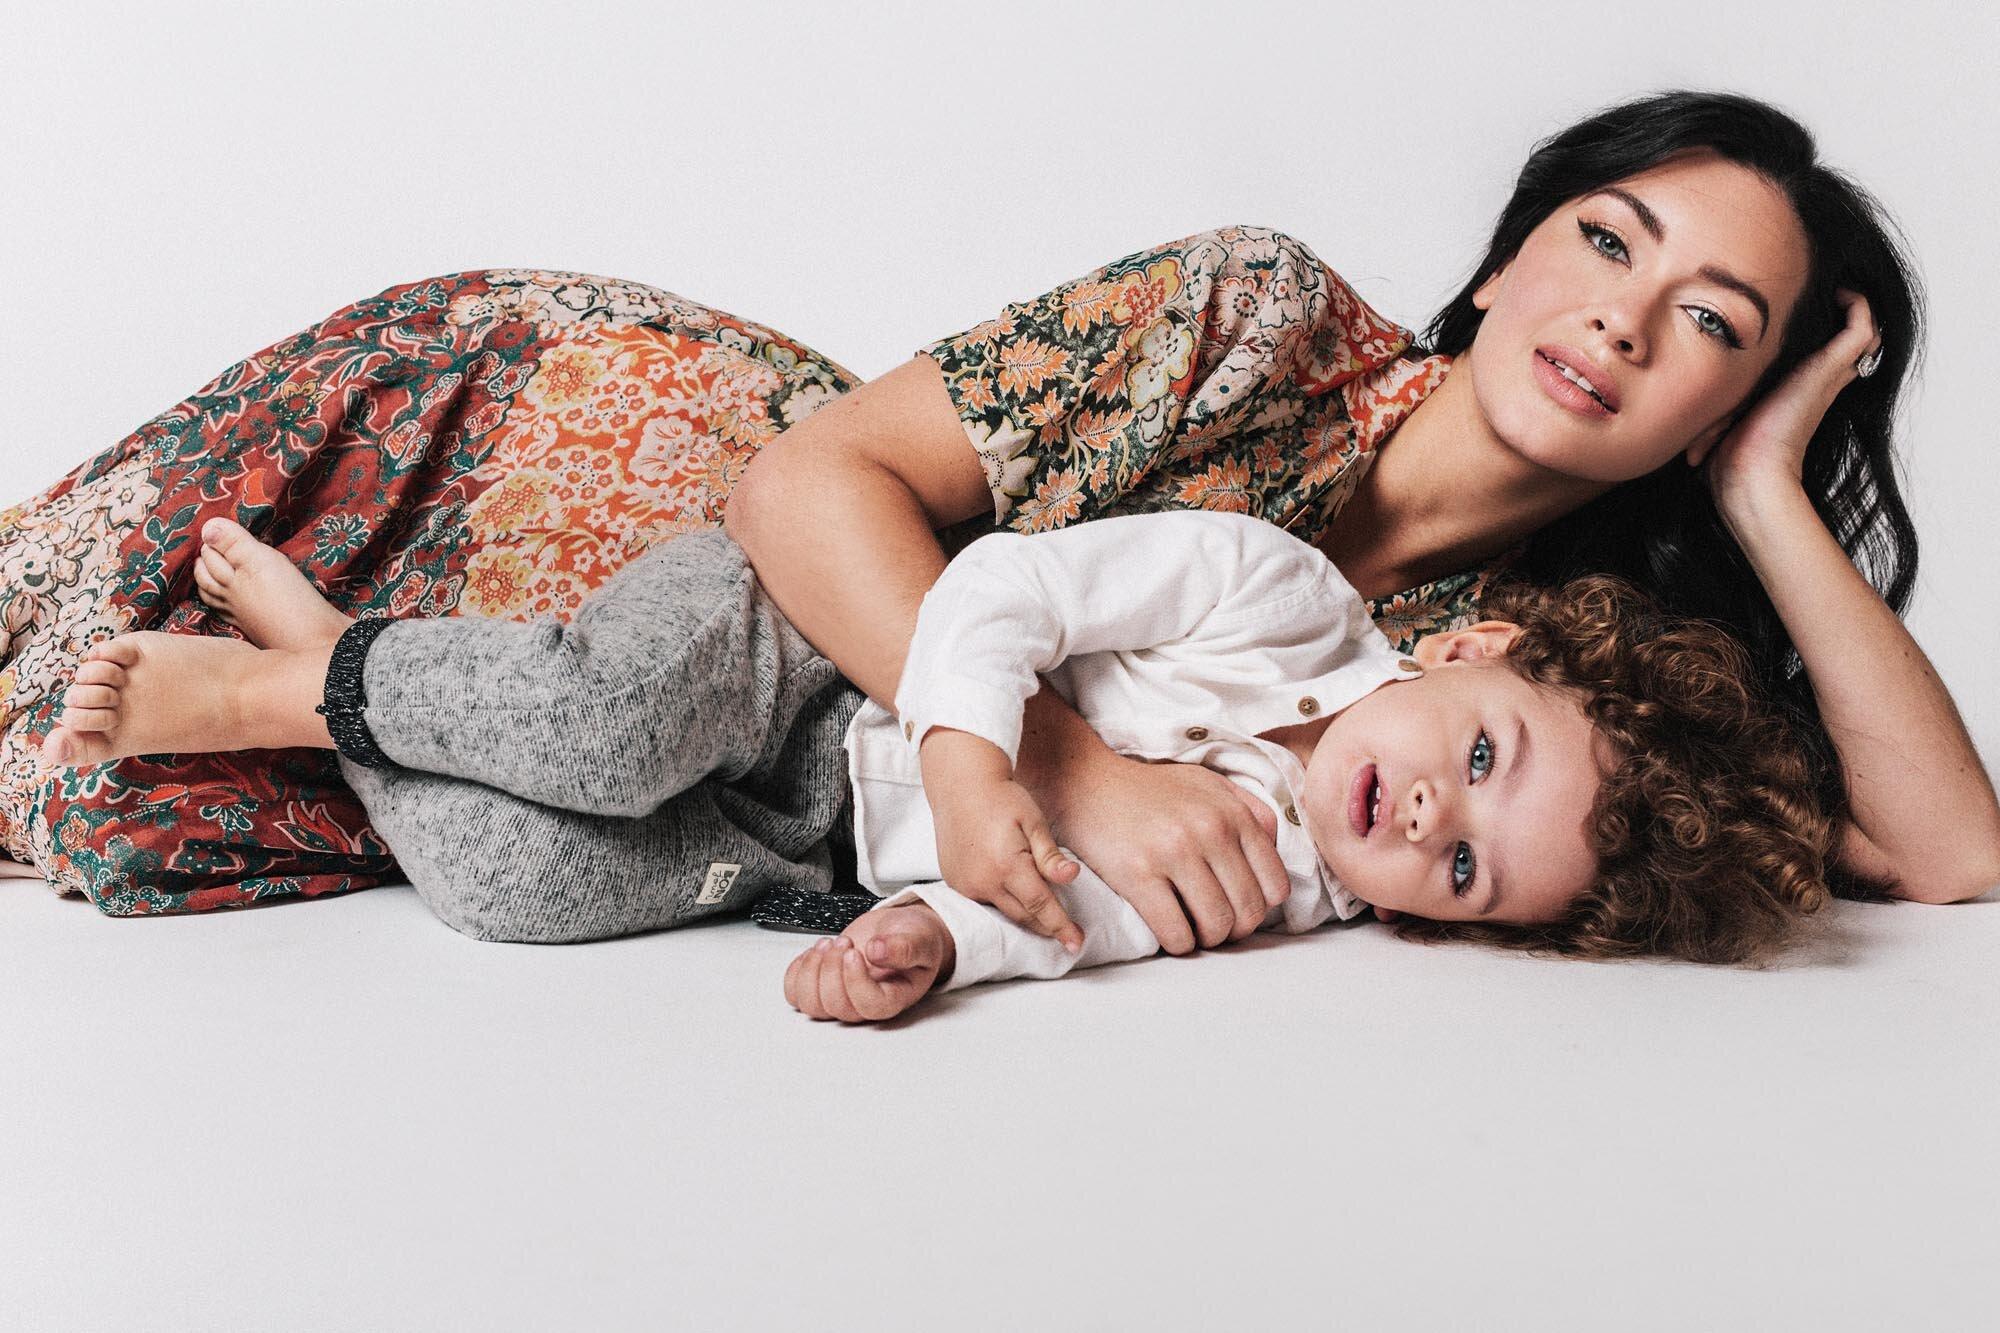 nyc-photographers-family-photographer-10006.jpg